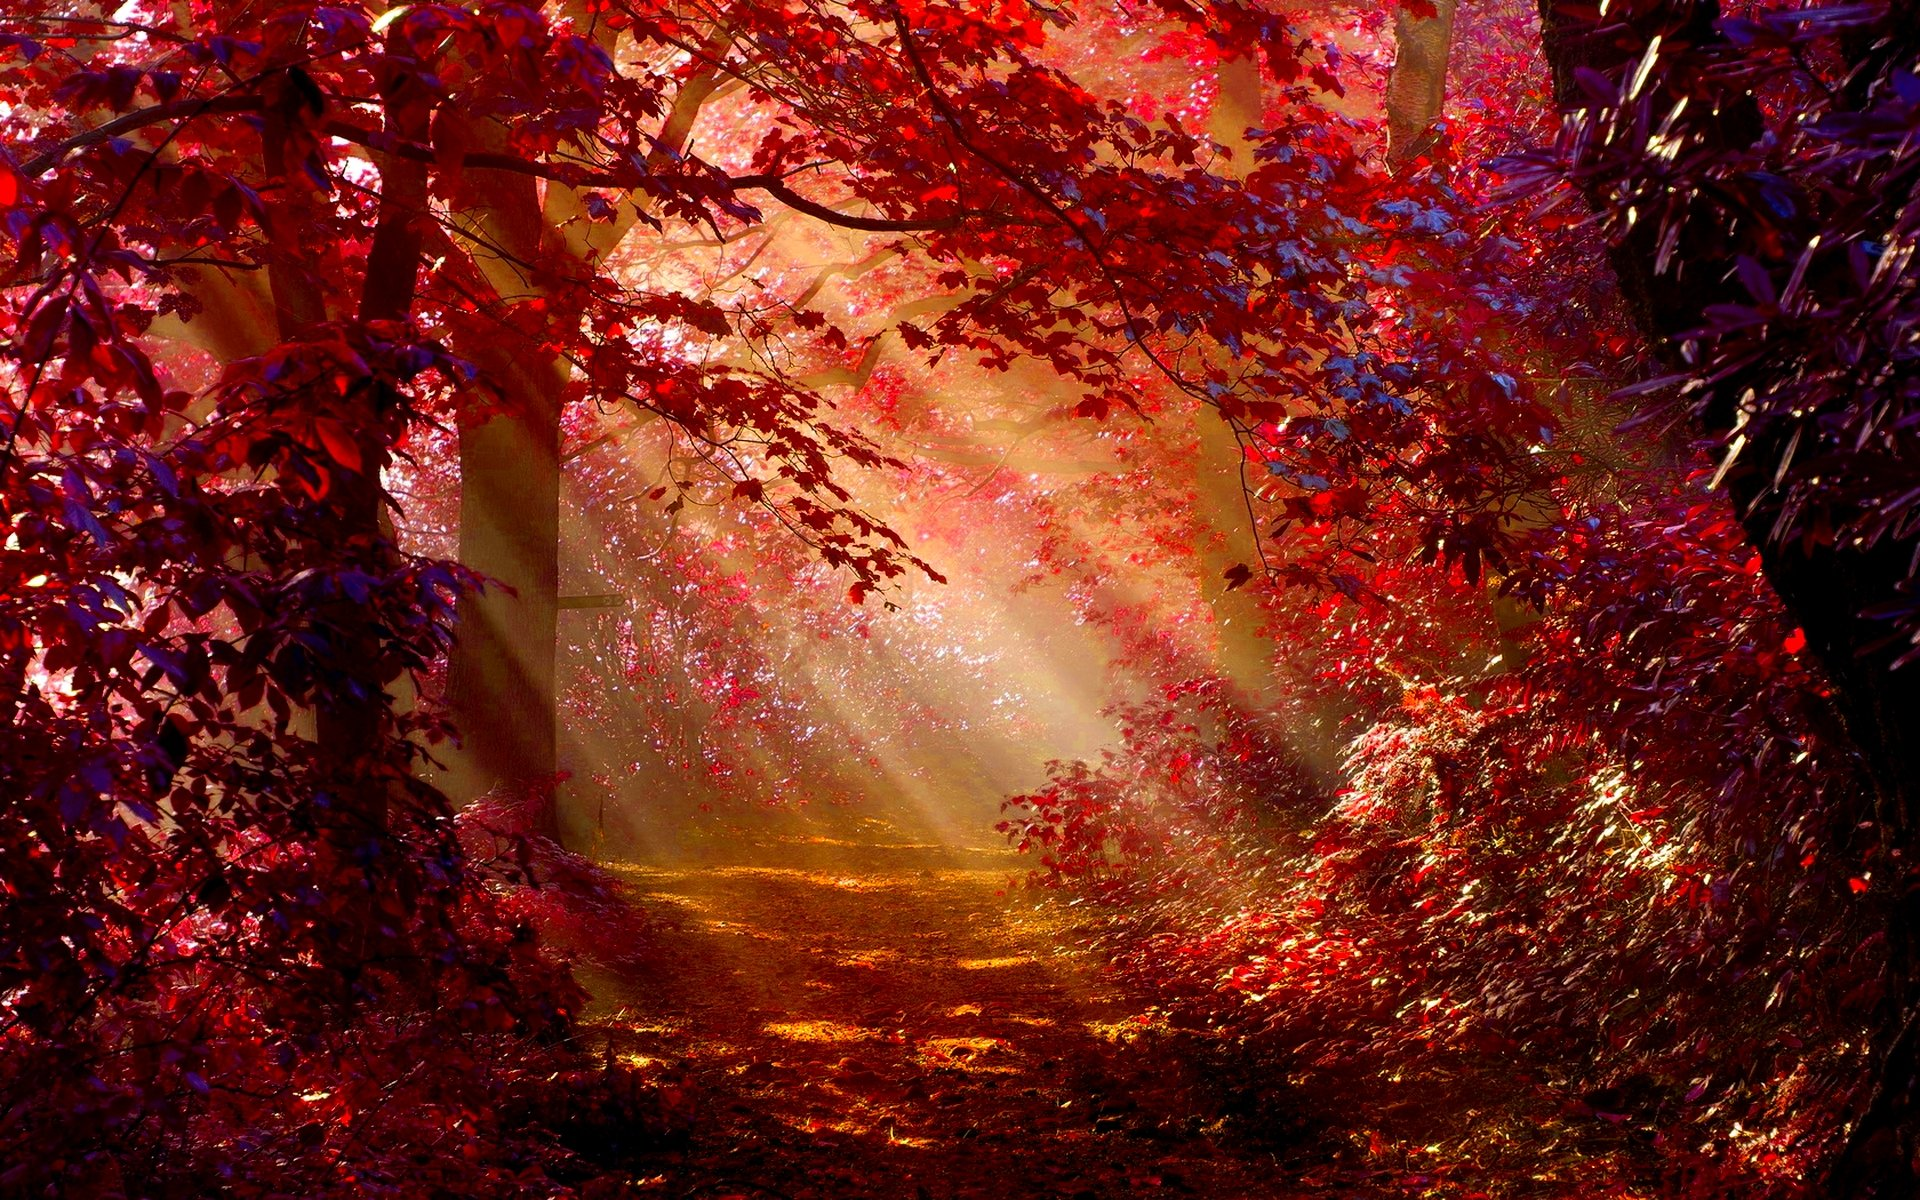 Sunlight In Autumn Forest Forest Wallpaper Autumn 137392